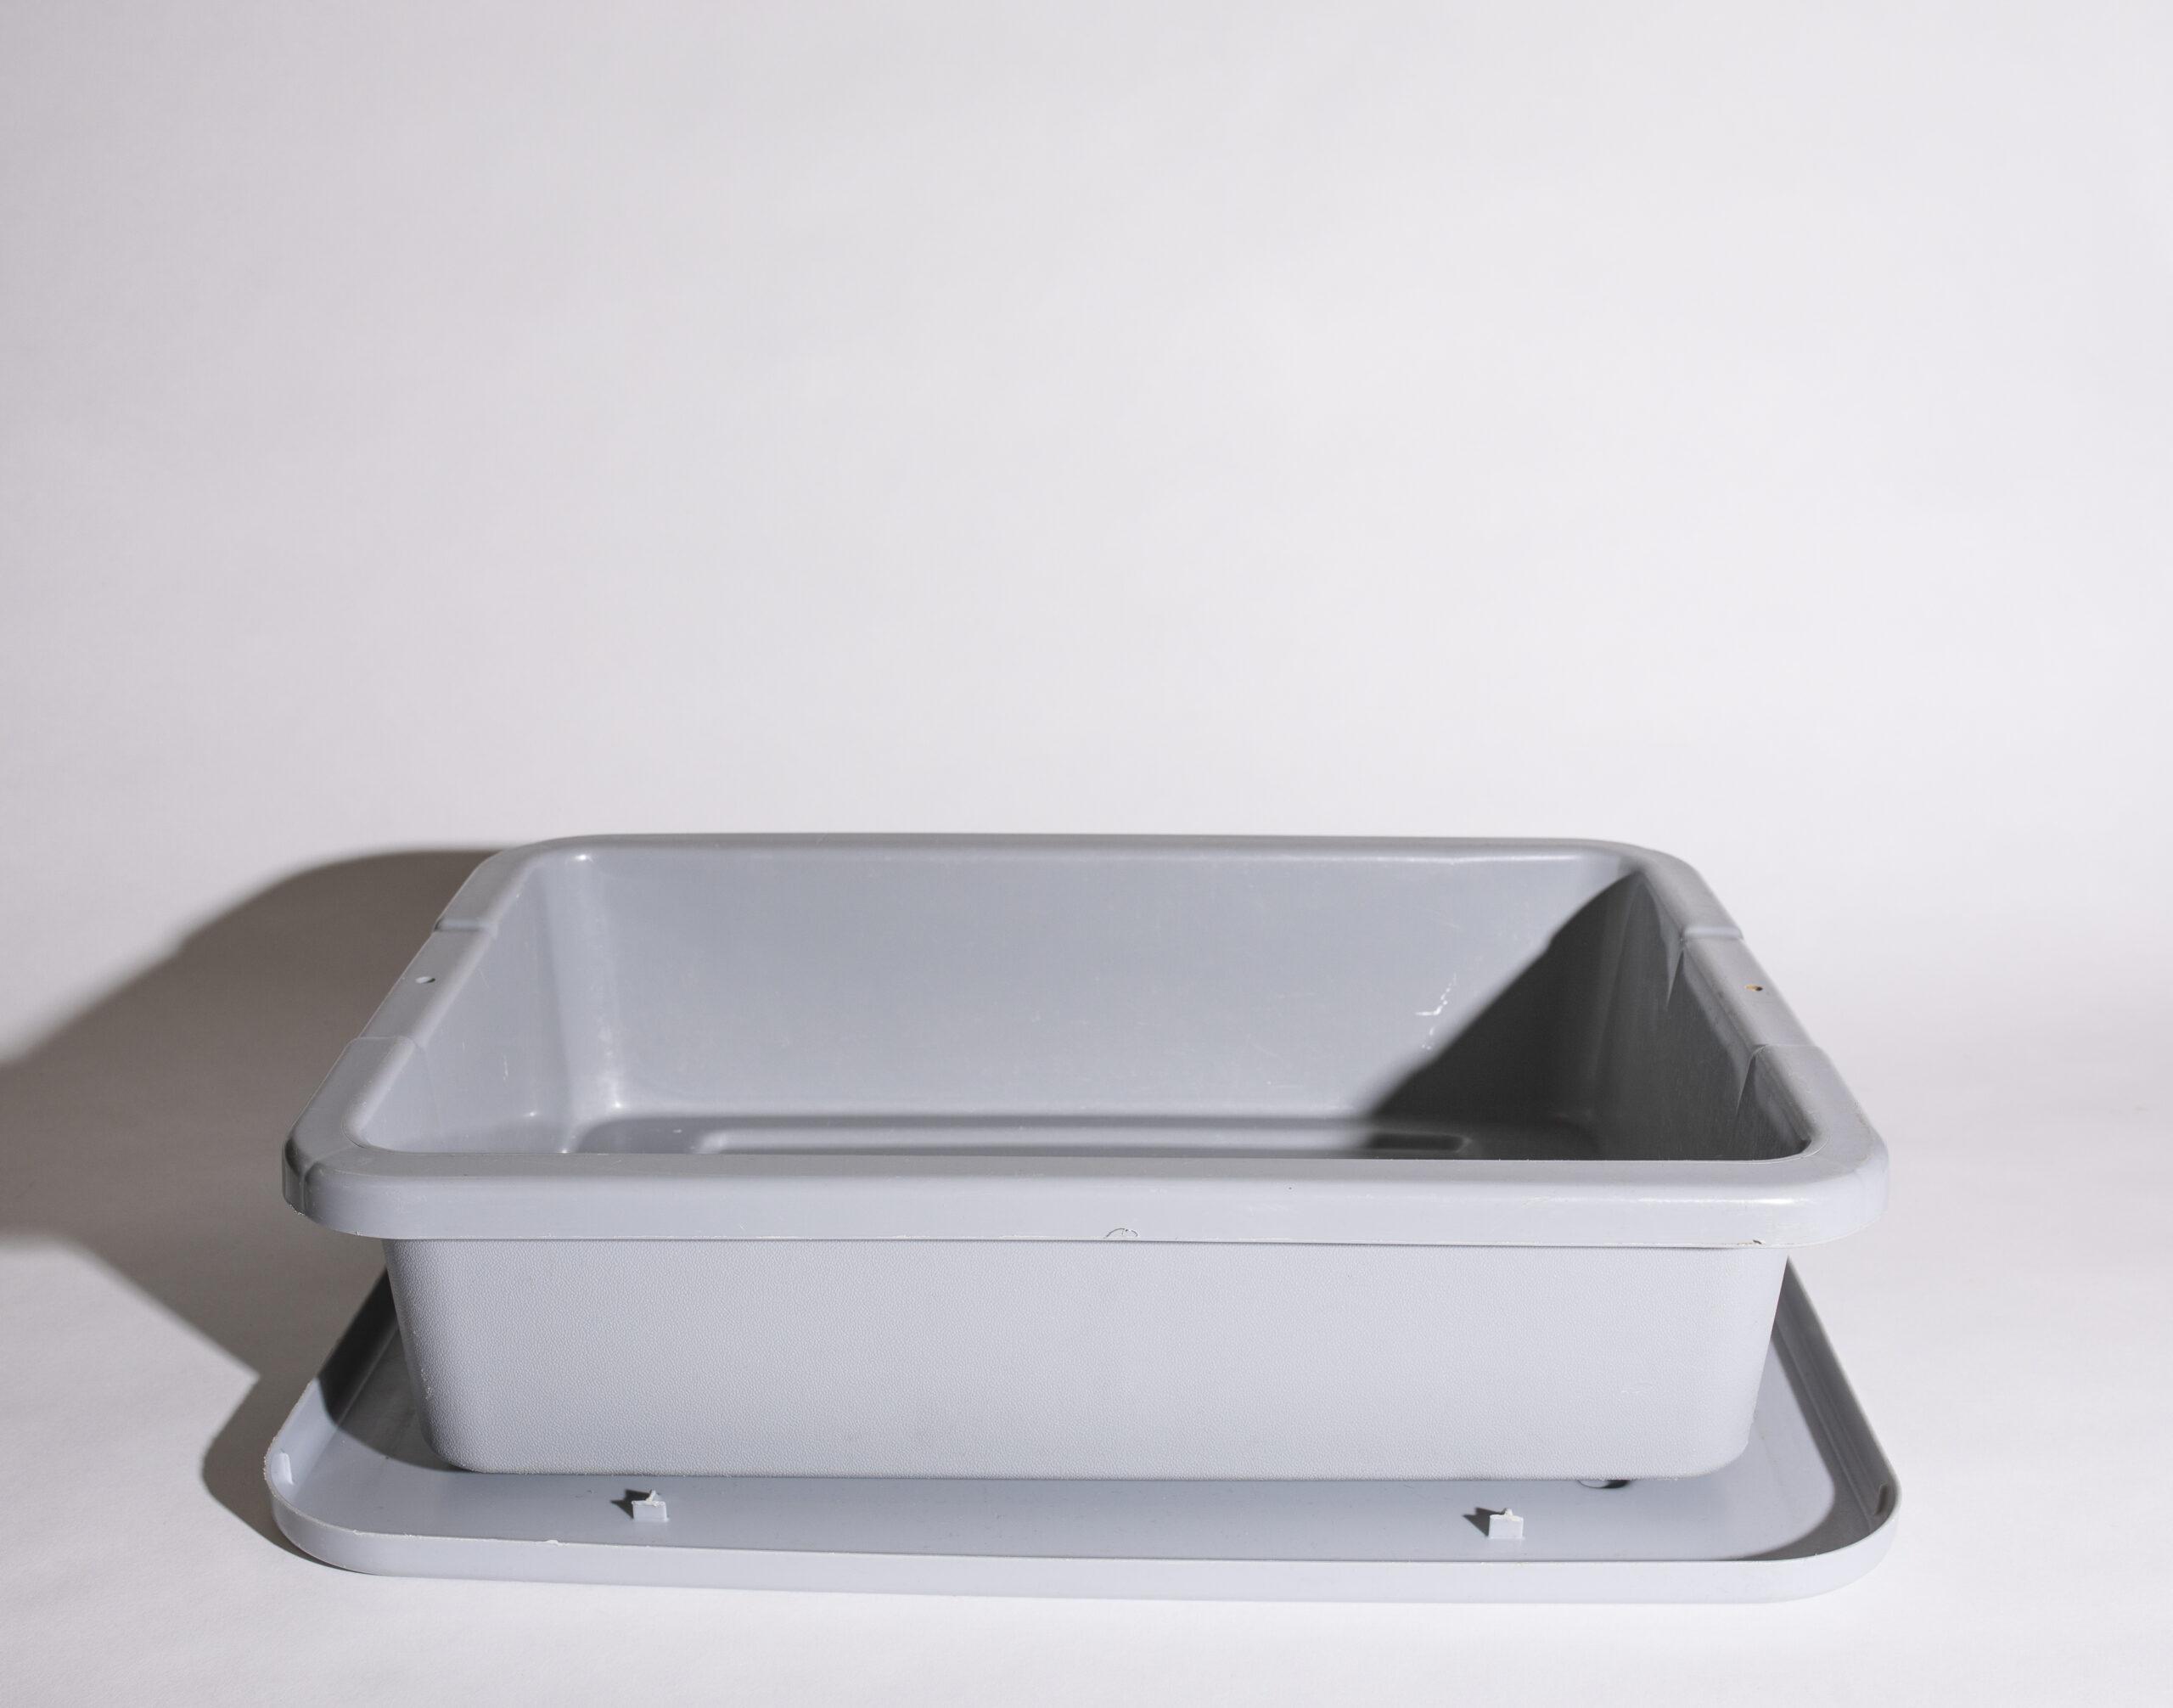 Bus pan & lid (grey, plastic)